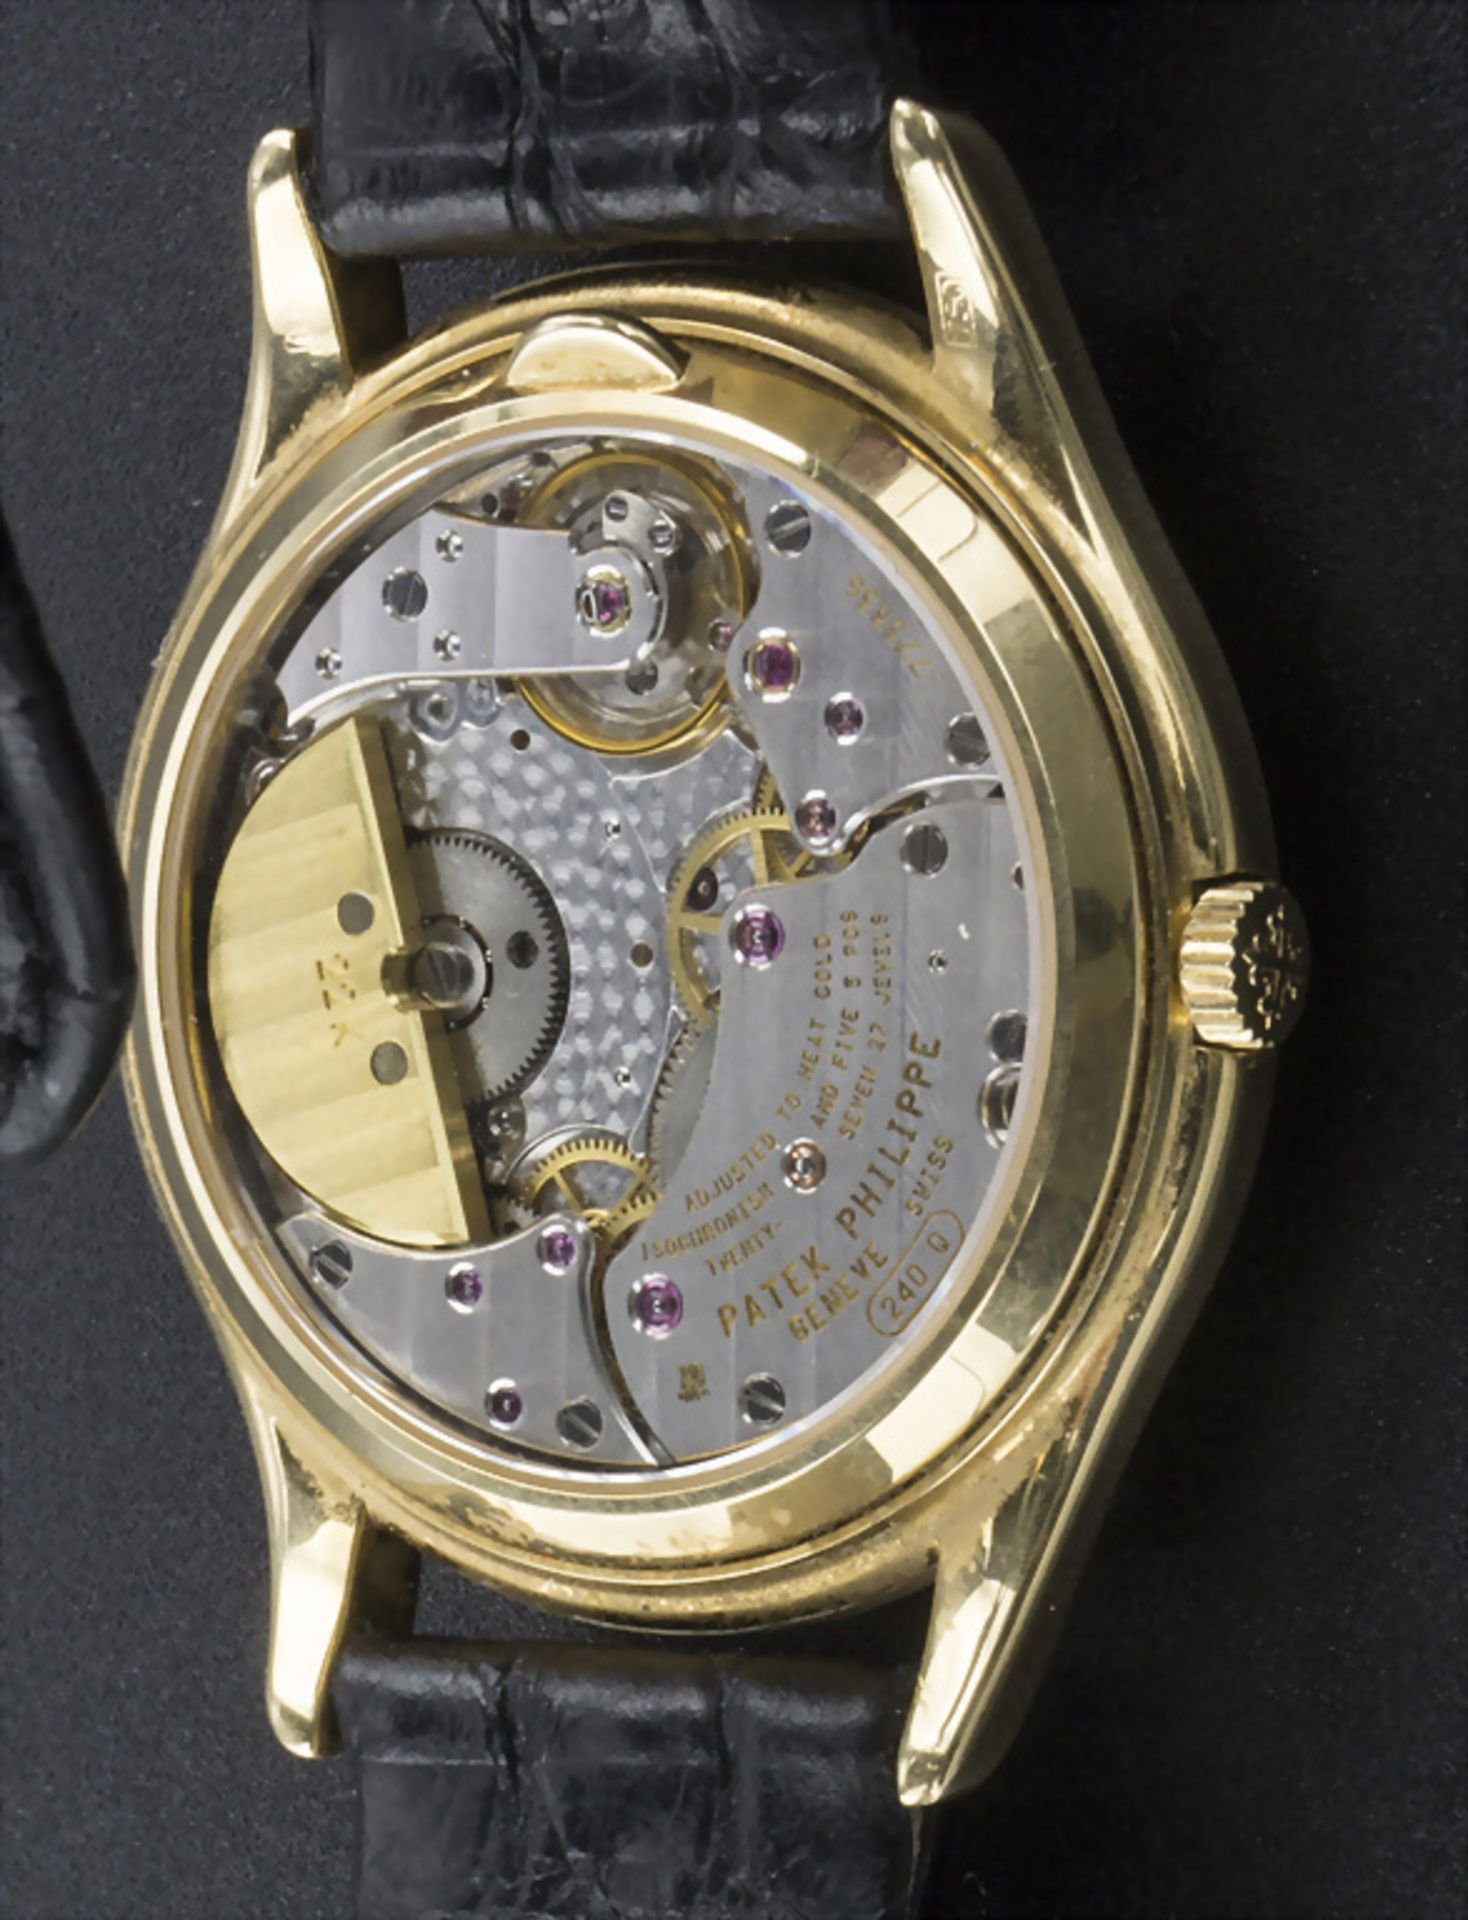 Armbanduhr, Automatik mit ewigem Kalender / A men's automatic wristwatch with perpetual ... - Image 4 of 7